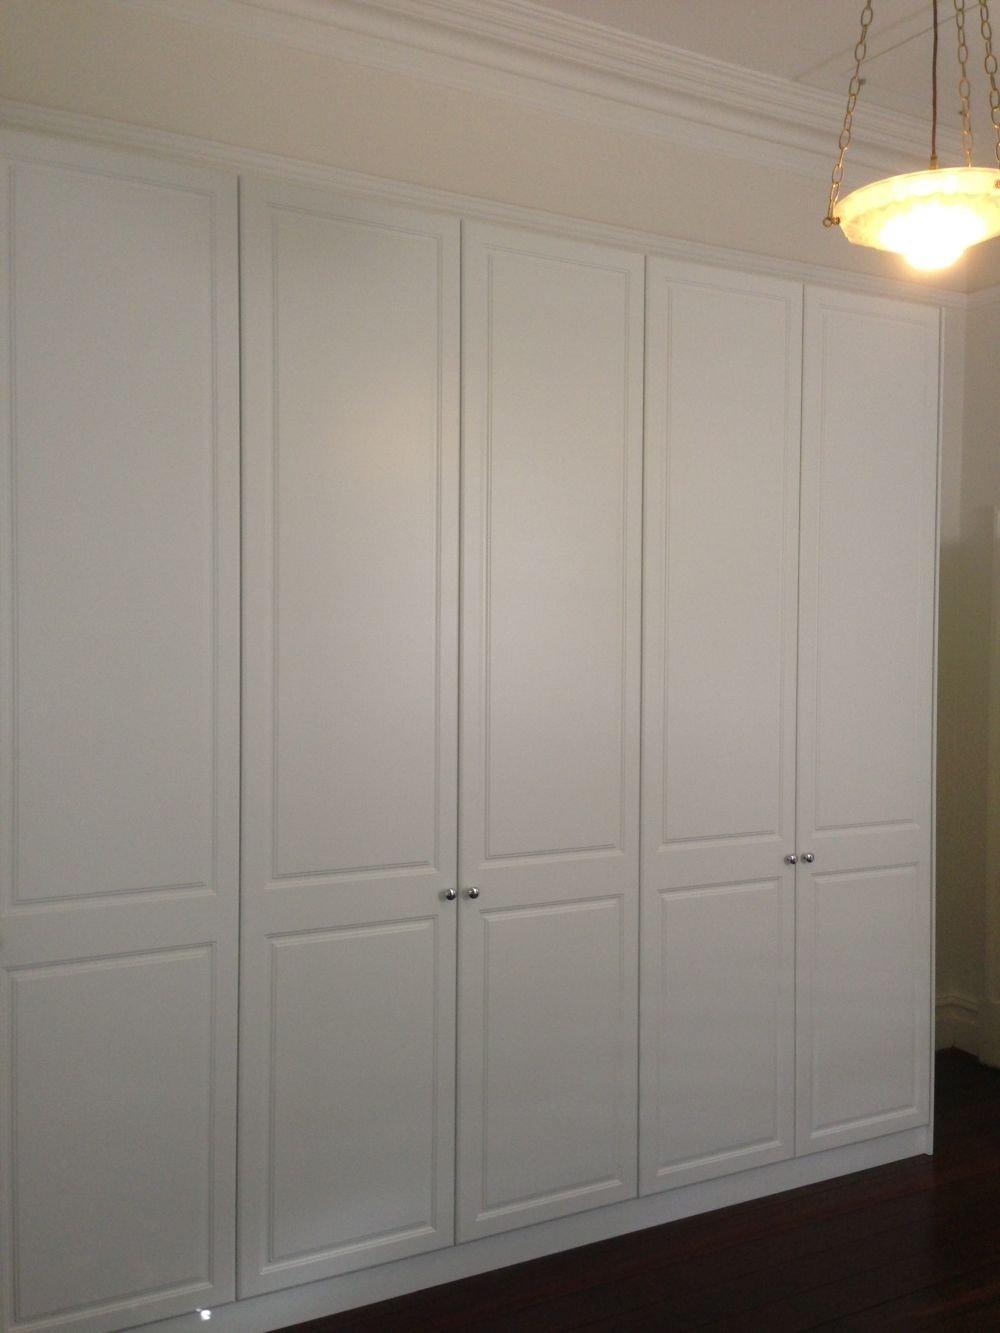 full height 5 door hinged wardrobe in vinyl wrap